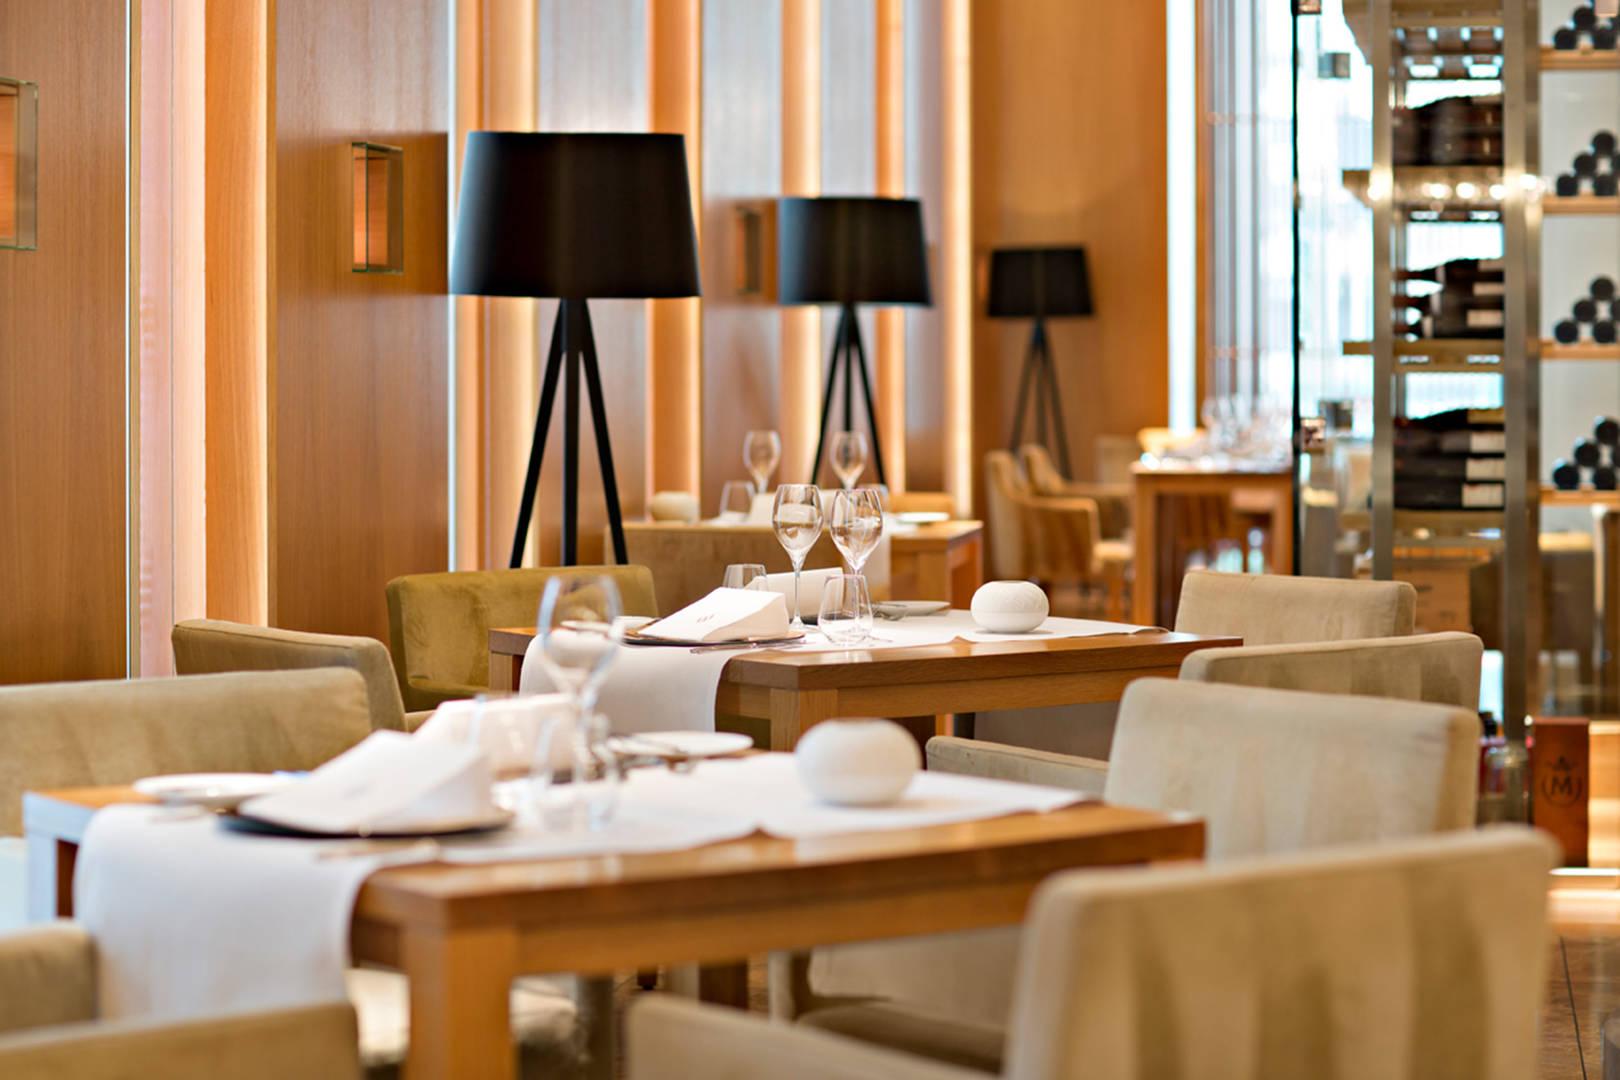 https://cdn.jumeirah.com/-/mediadh/DH/Hospitality/Jumeirah/Restaurants/Frankfurt/Frankfurt-Max-On-One-Grill-Room/Restaurant-Gallery/JumeirahFrankfurtMaxonOne464.jpg?h=1080&w=1620&hash=C53FA9AADDCF82C4E8B7F17CCEAB06FD